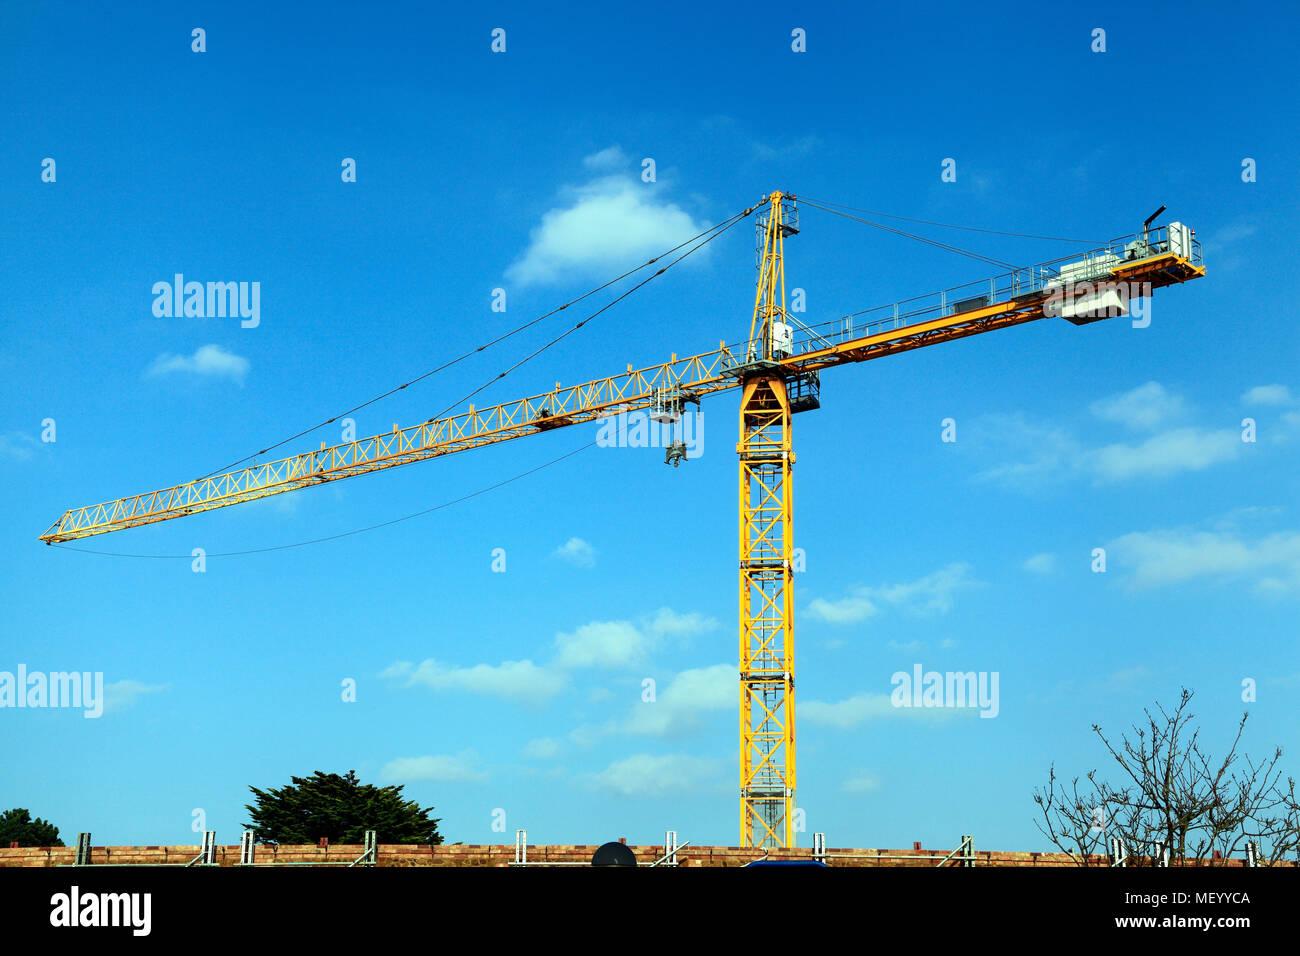 Construction Crane, Building Site, Hunstanton, Norfolk, cranes, sites, England, UK - Stock Image